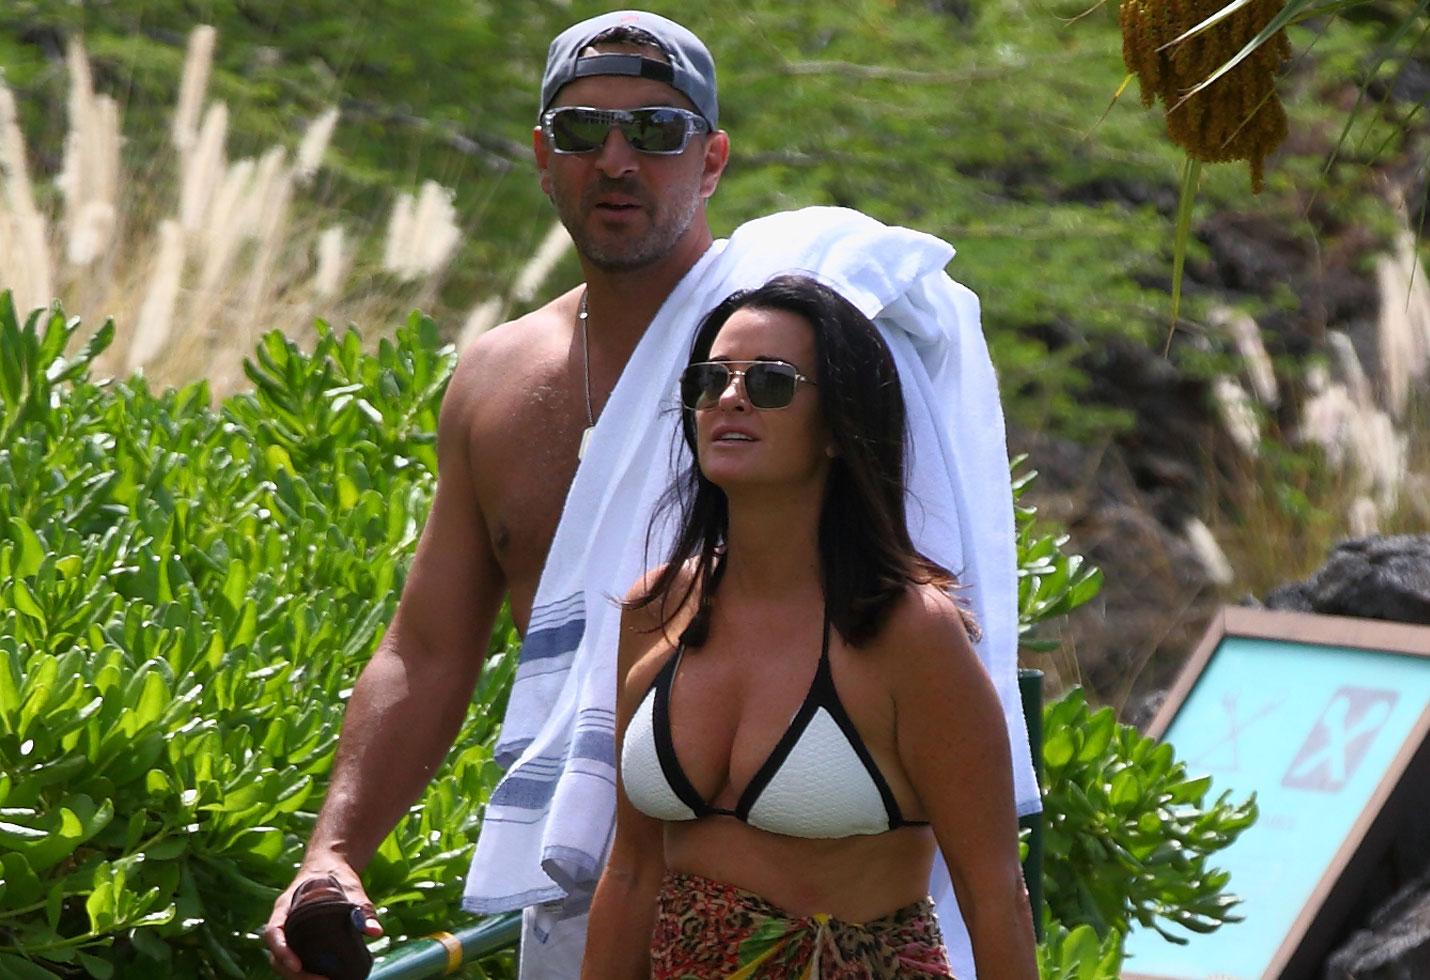 Kyle Richards Bikini Mauricio Umansky Shirtless Camille Grammer Wedding Hawaii RHOBH Season 9